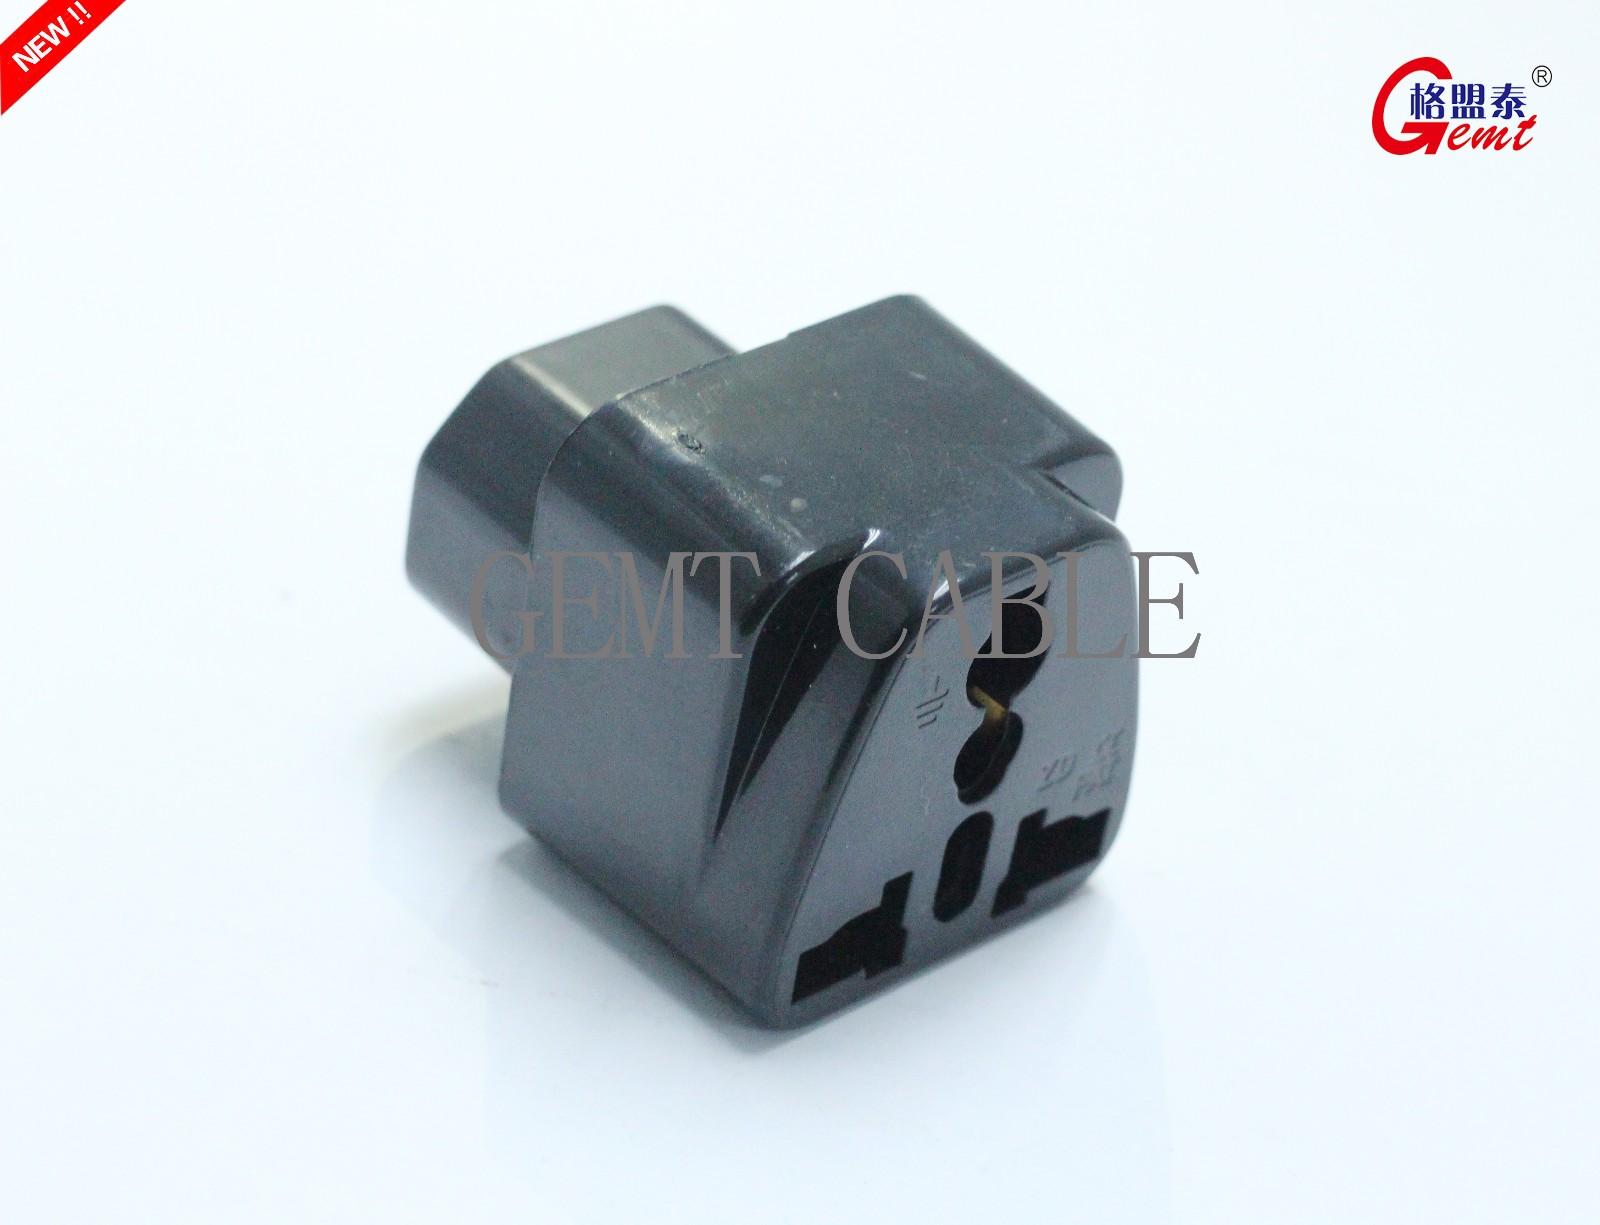 WD-320 IEC Universal Adapter